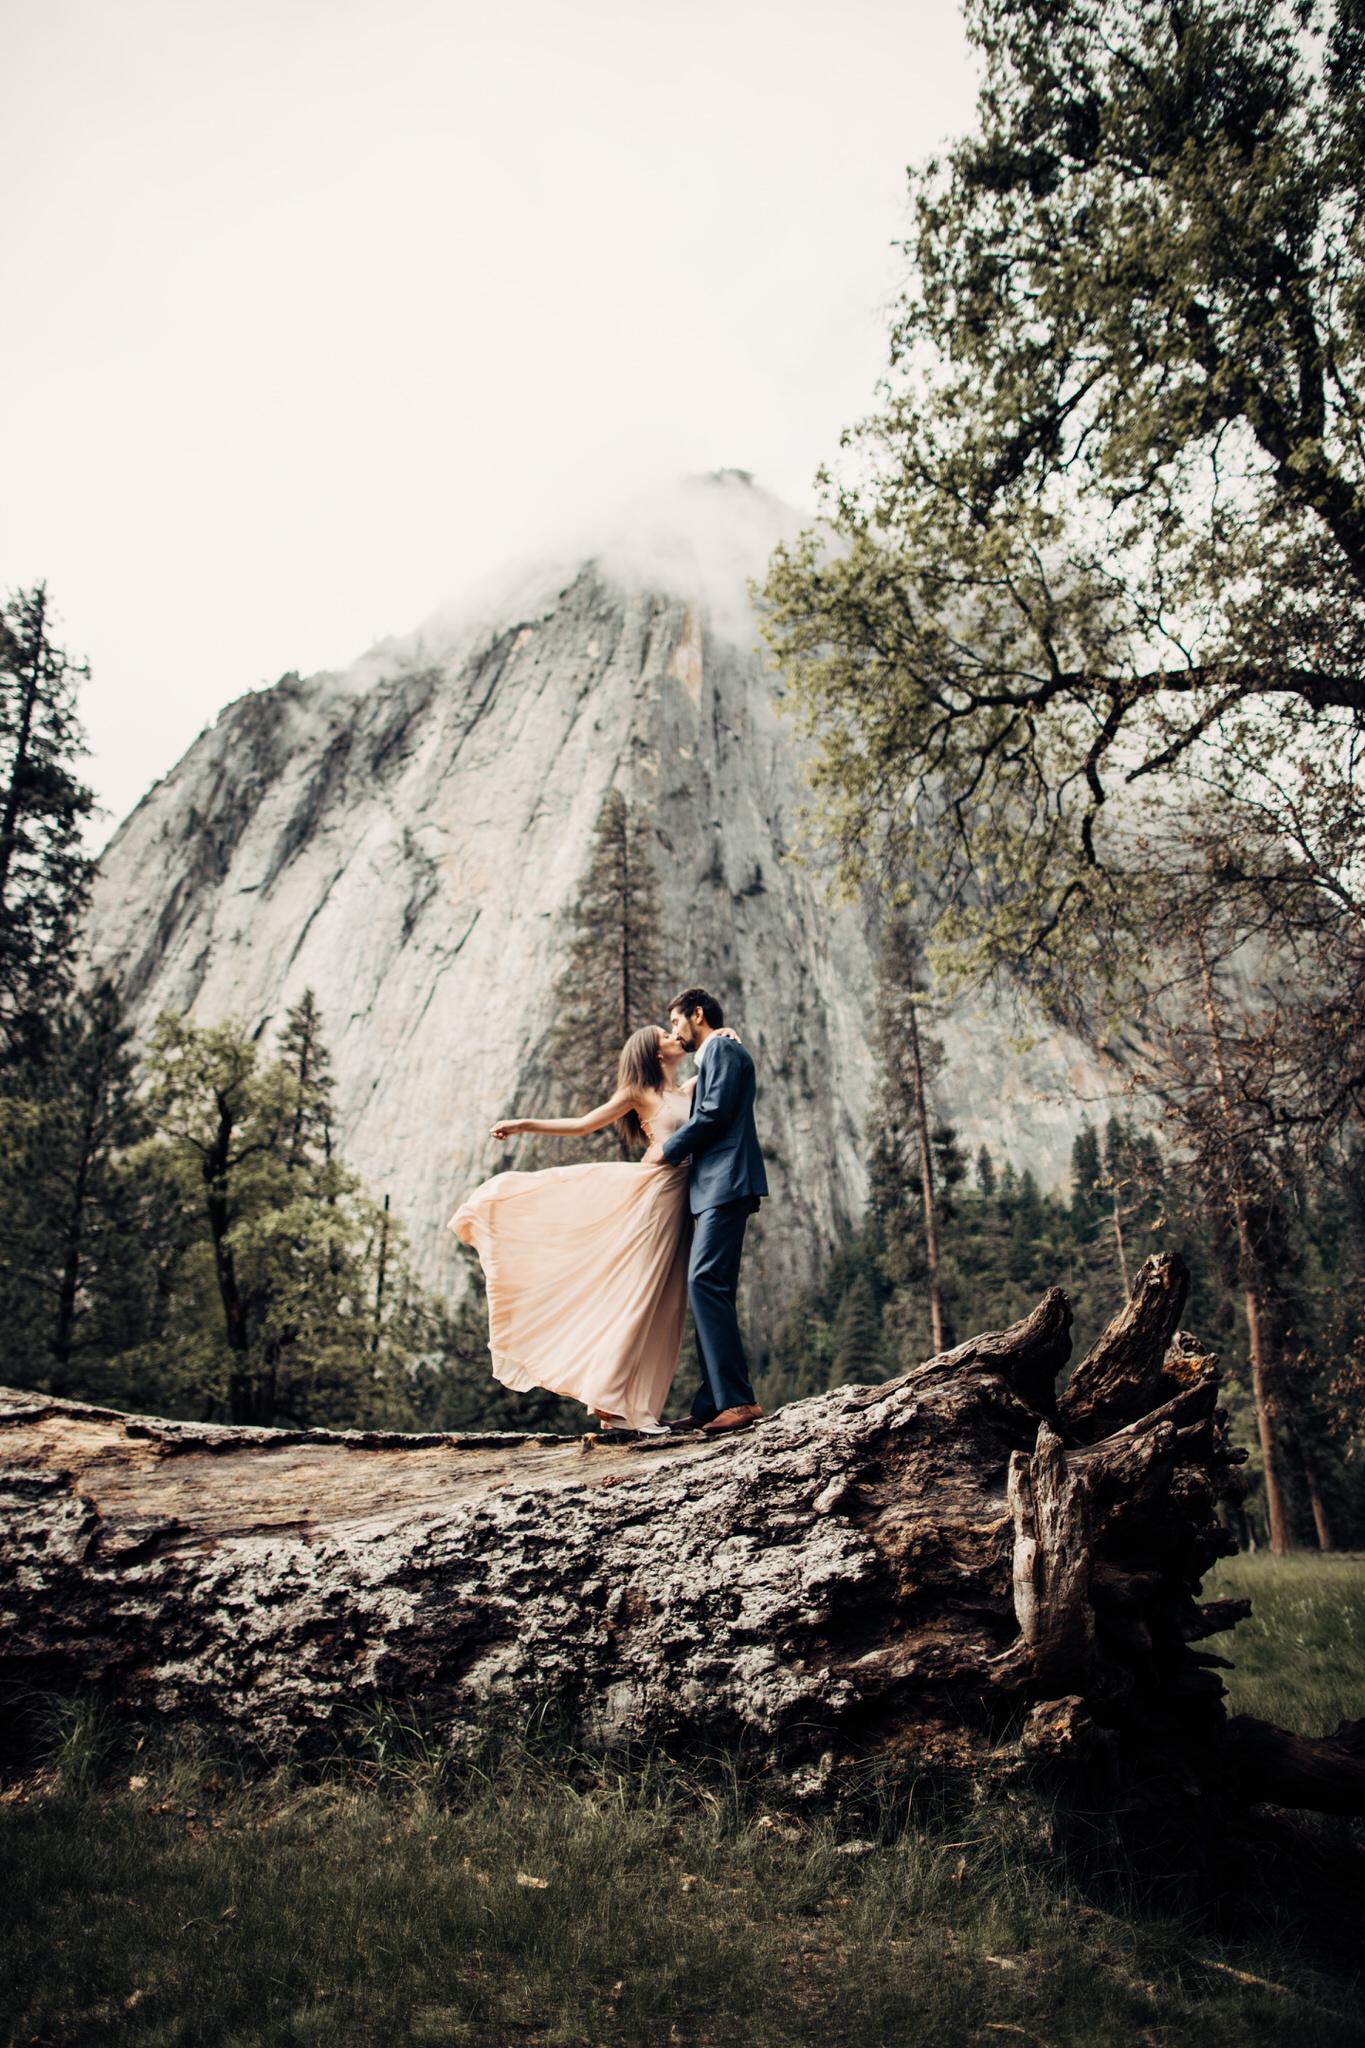 Yosemite-engagement-session-lauren-and-tom76.jpg